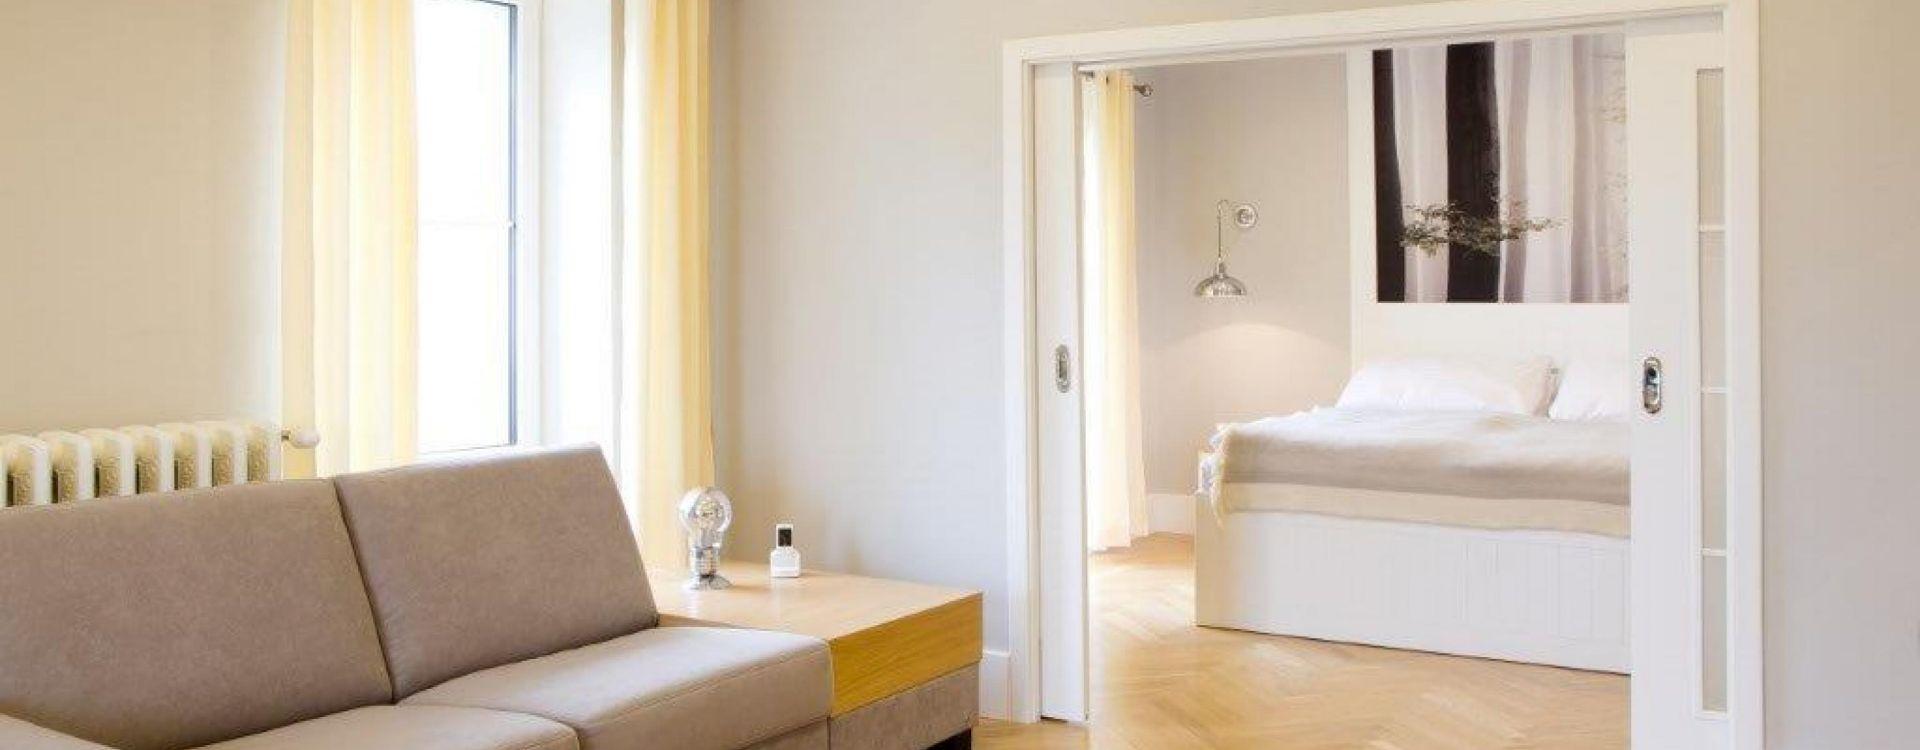 Wellness prodlou en pobyt spa boutique hotel l wenstein for Boutique hotel wellness